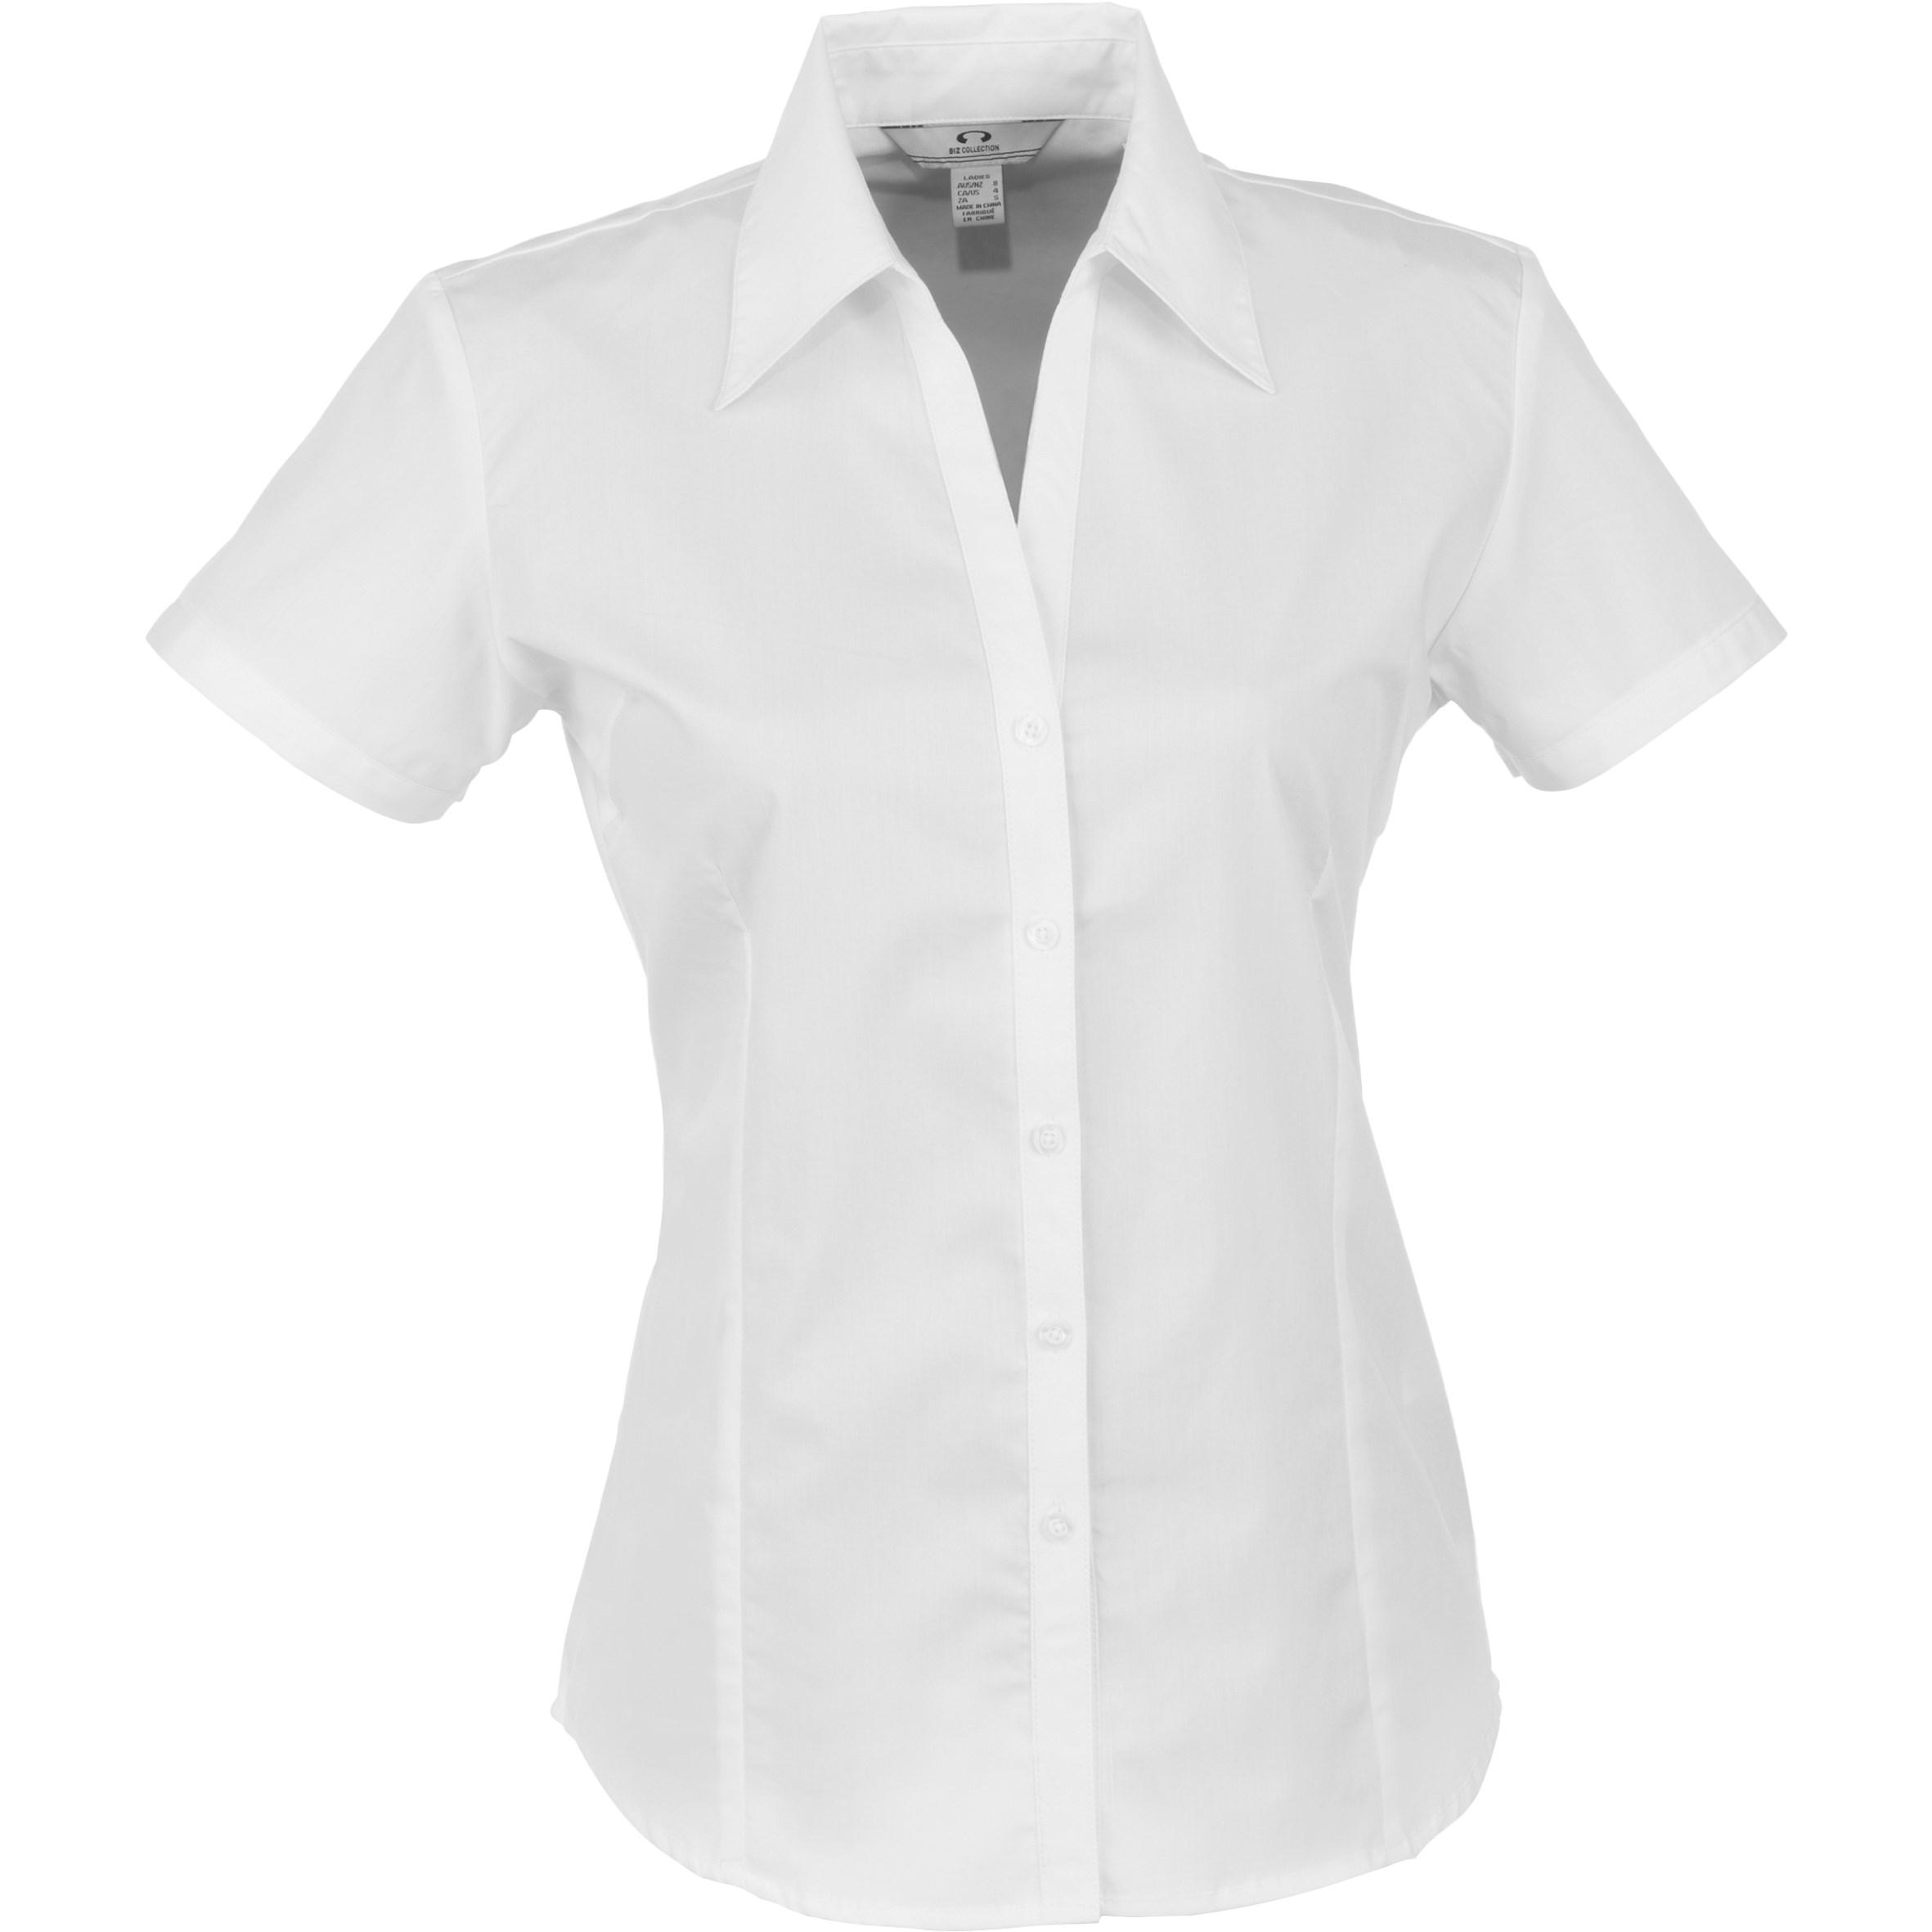 Ladies Short Sleeve Metro Shirt - White Only